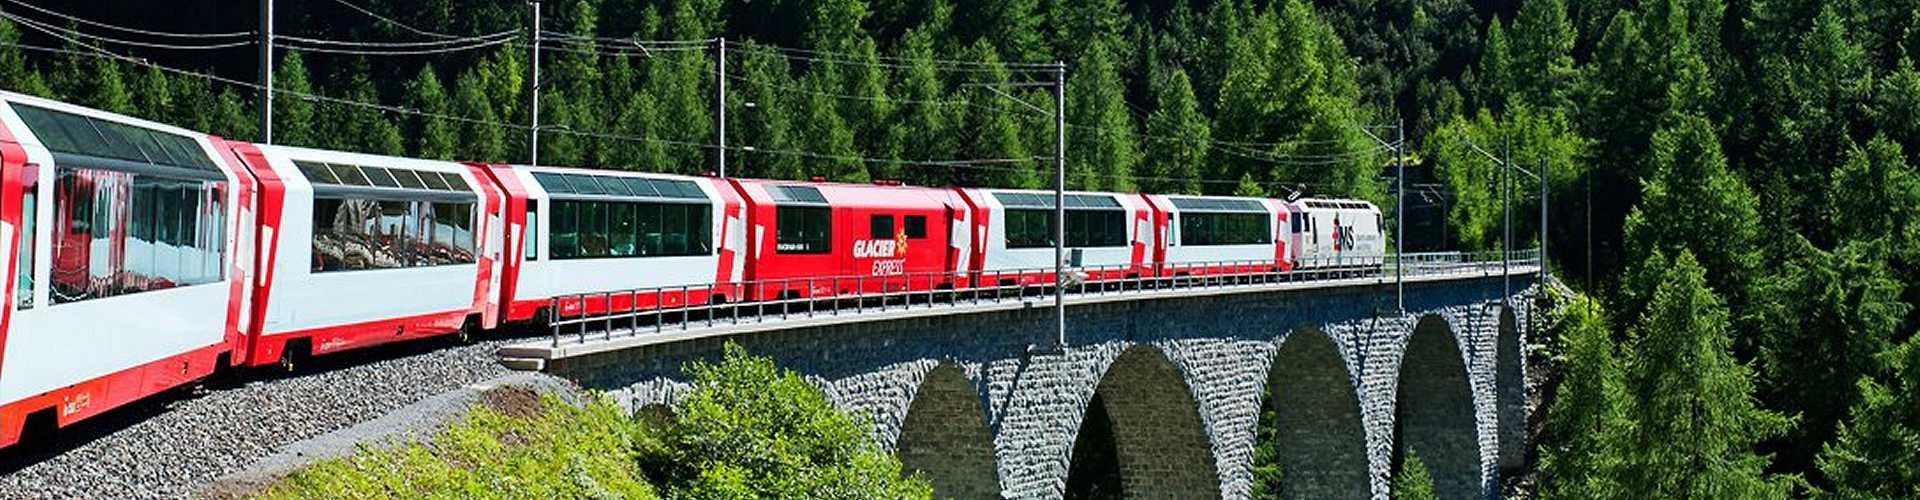 Glacier Express am Oberalp, Schweiz